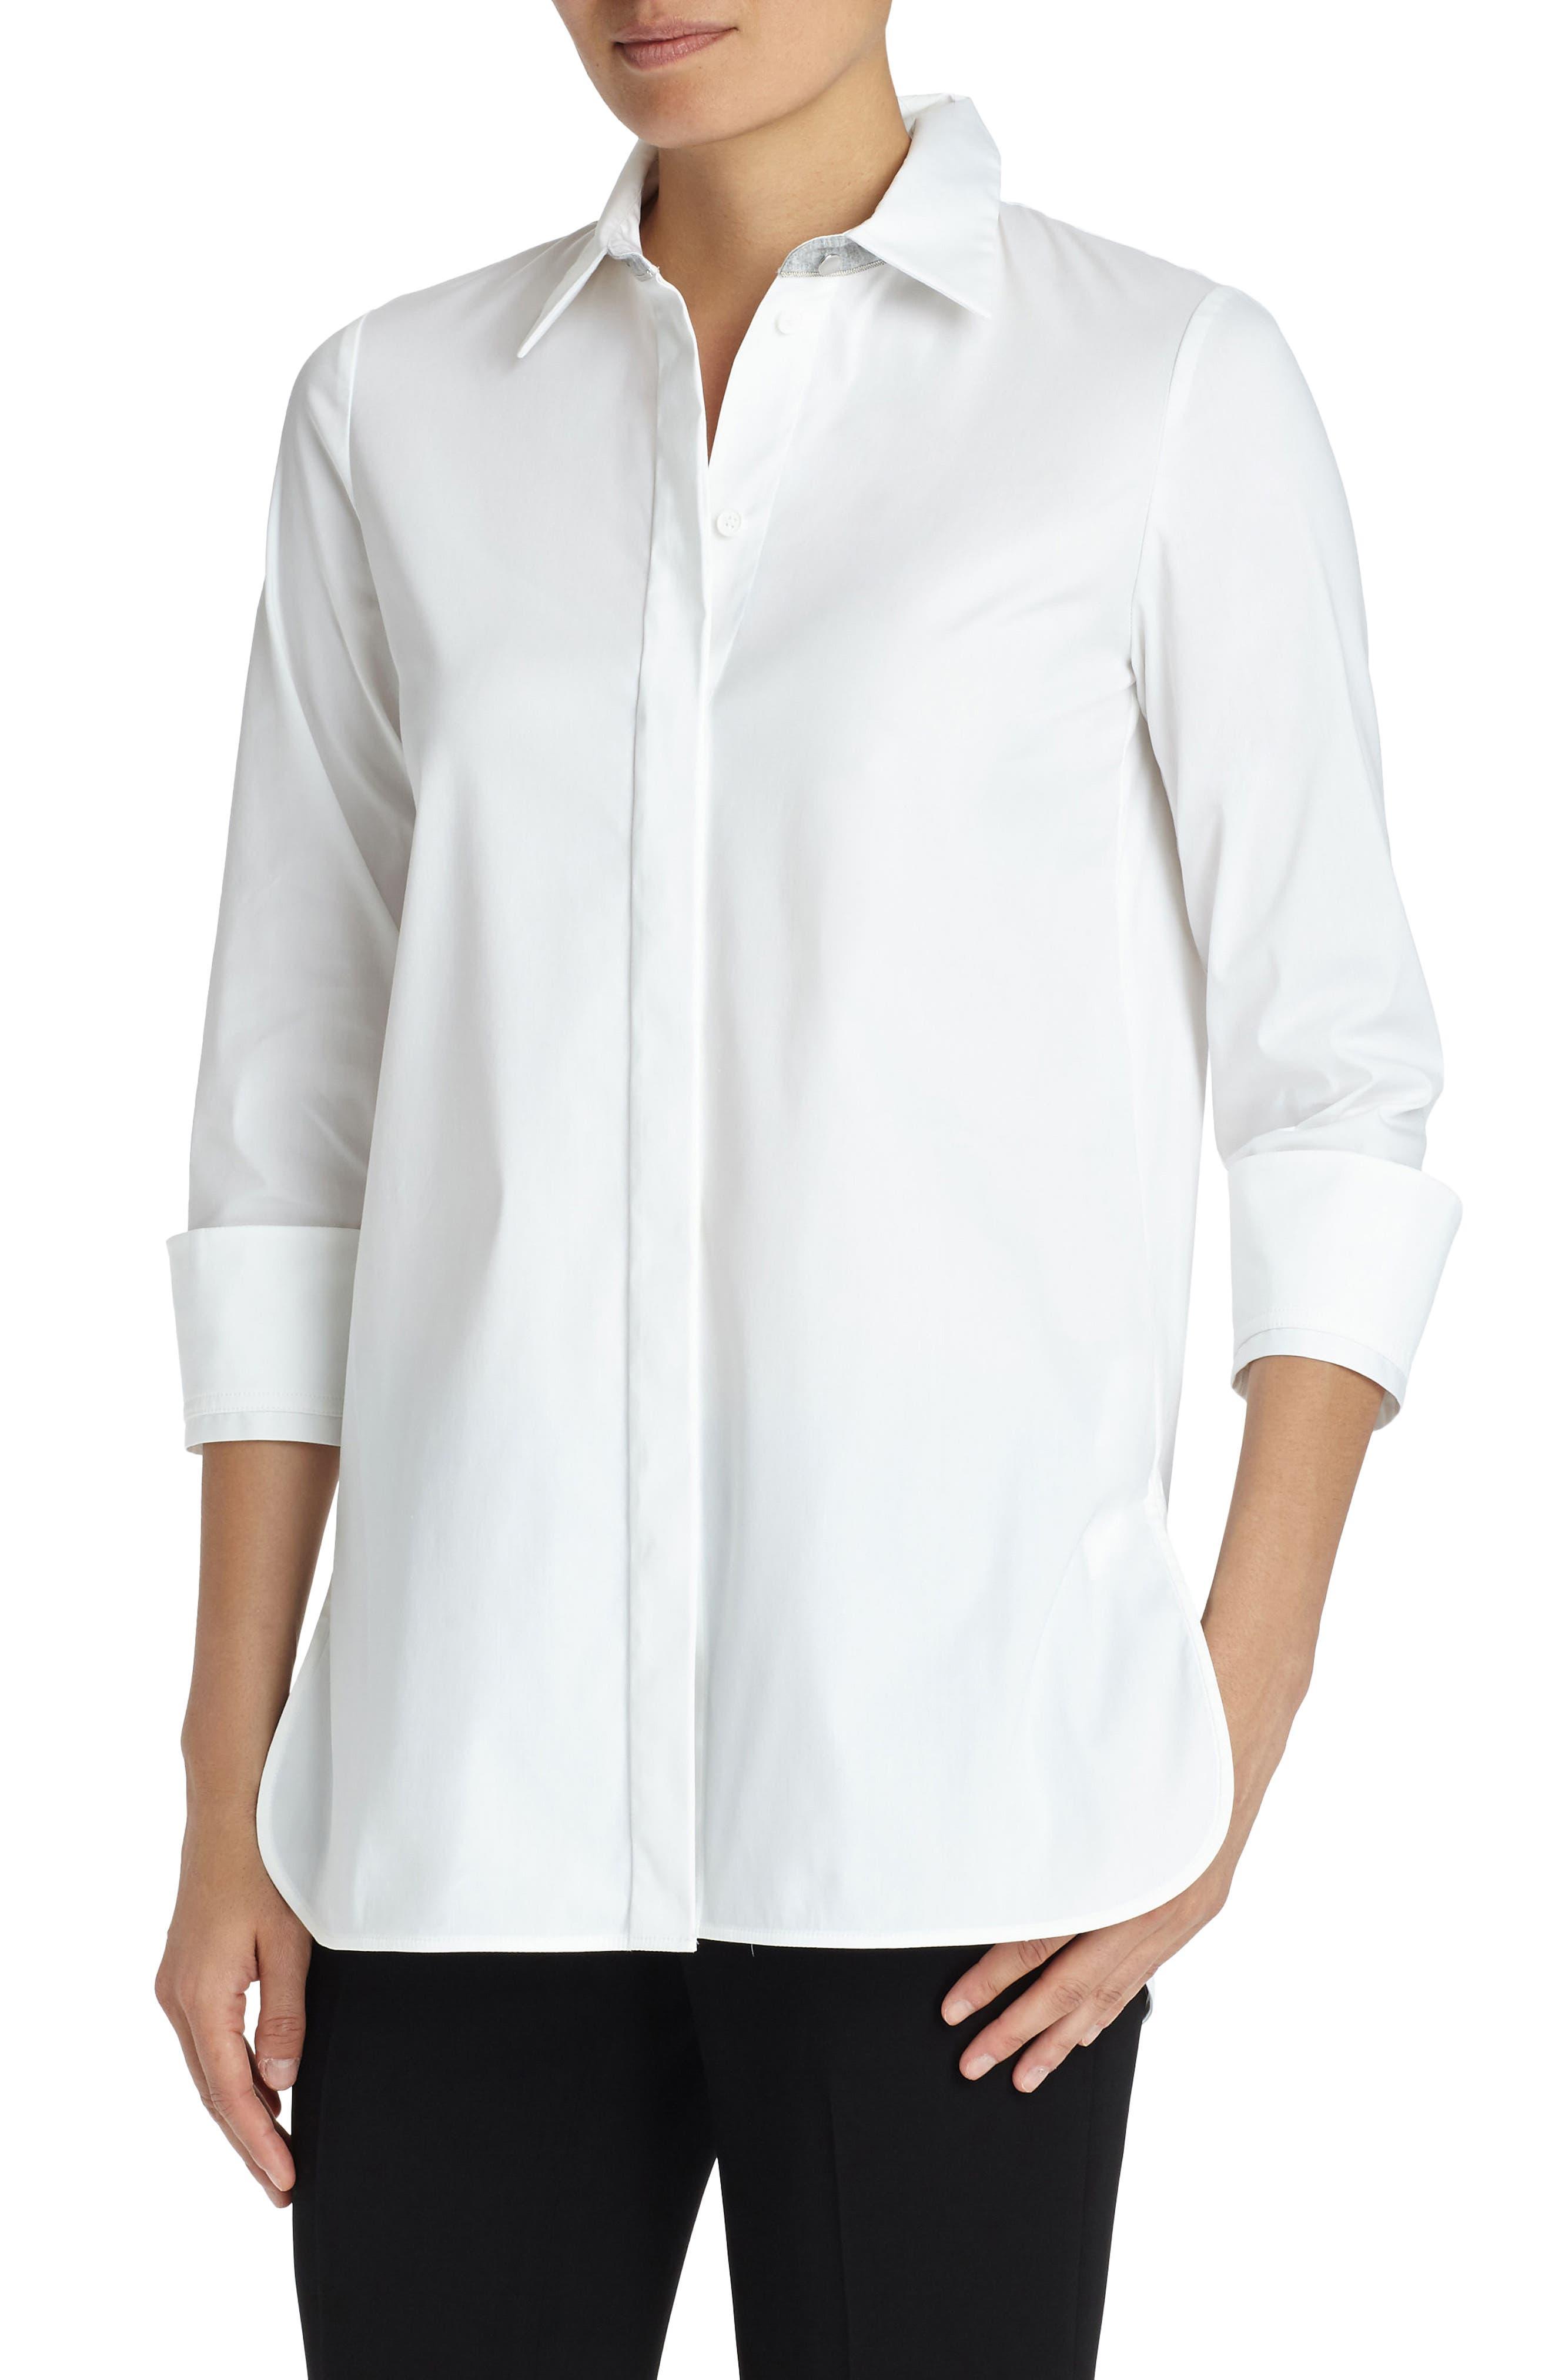 Augusta Stretch Cotton Shirt,                         Main,                         color, 100